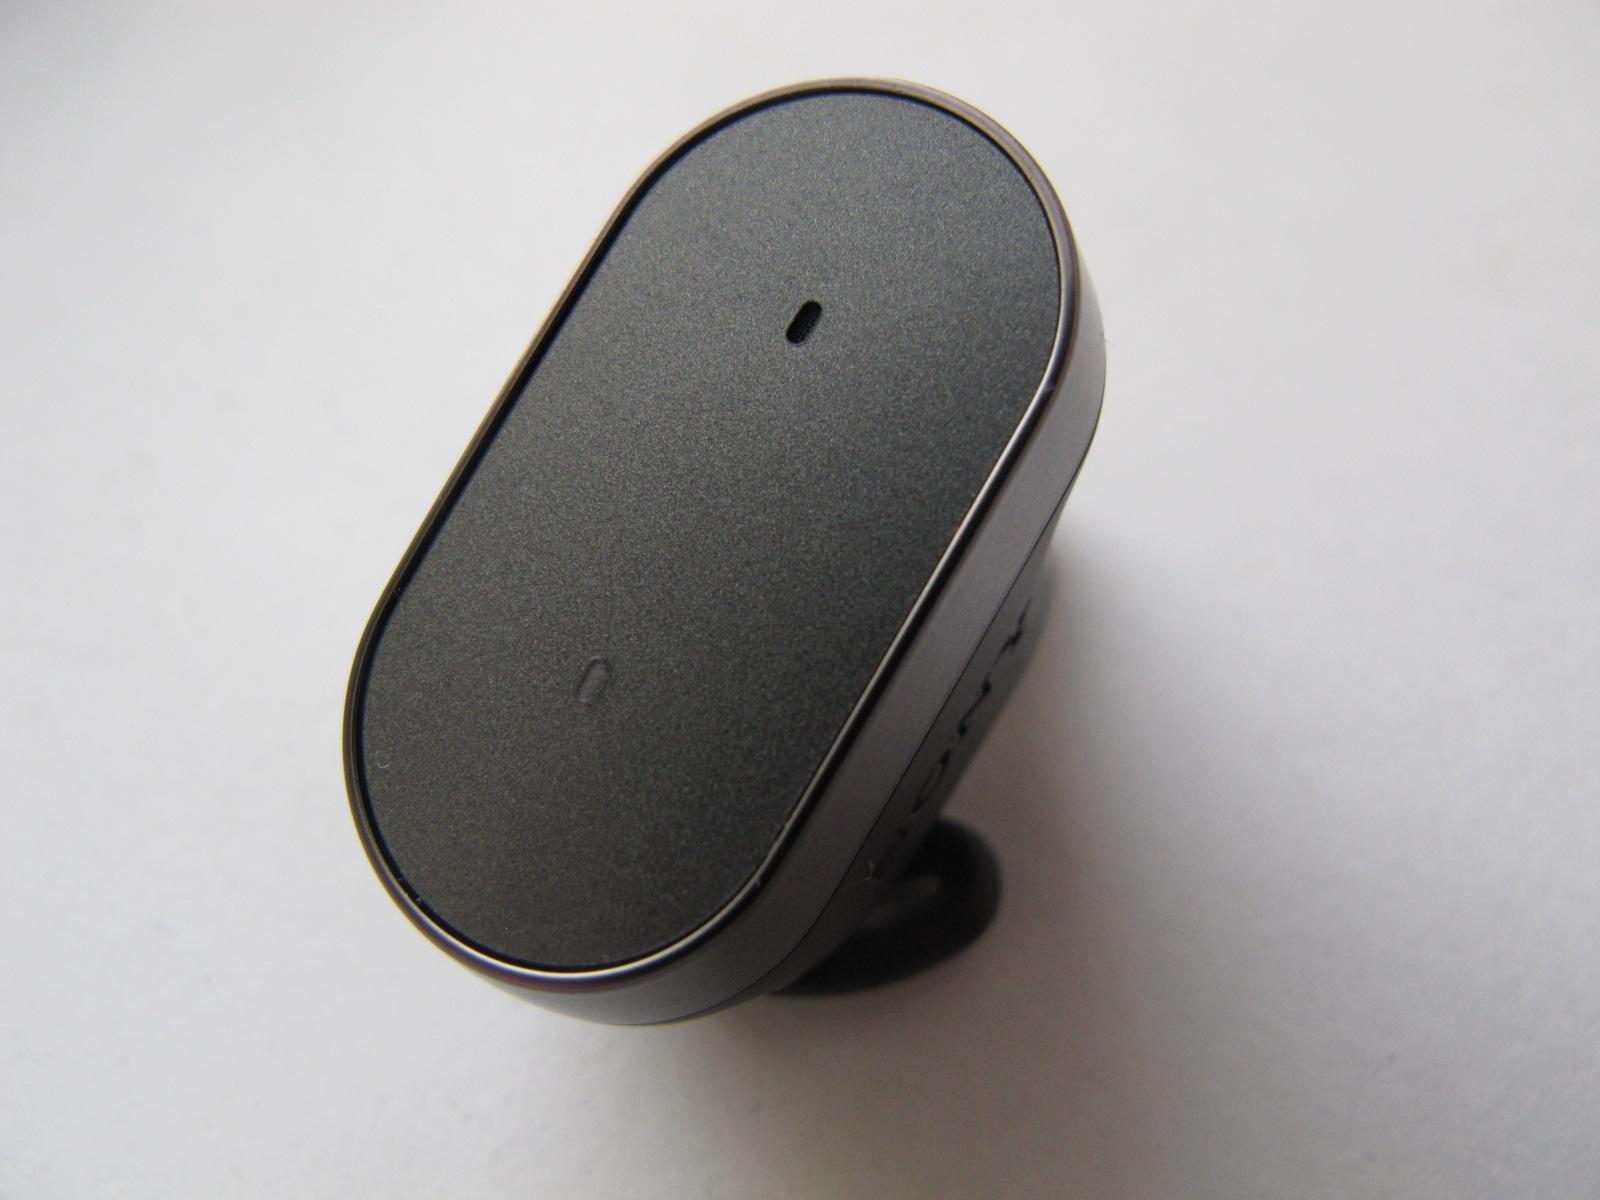 Sony Xperia Ear Xea10: голосовые помощники забрались в уши - 3